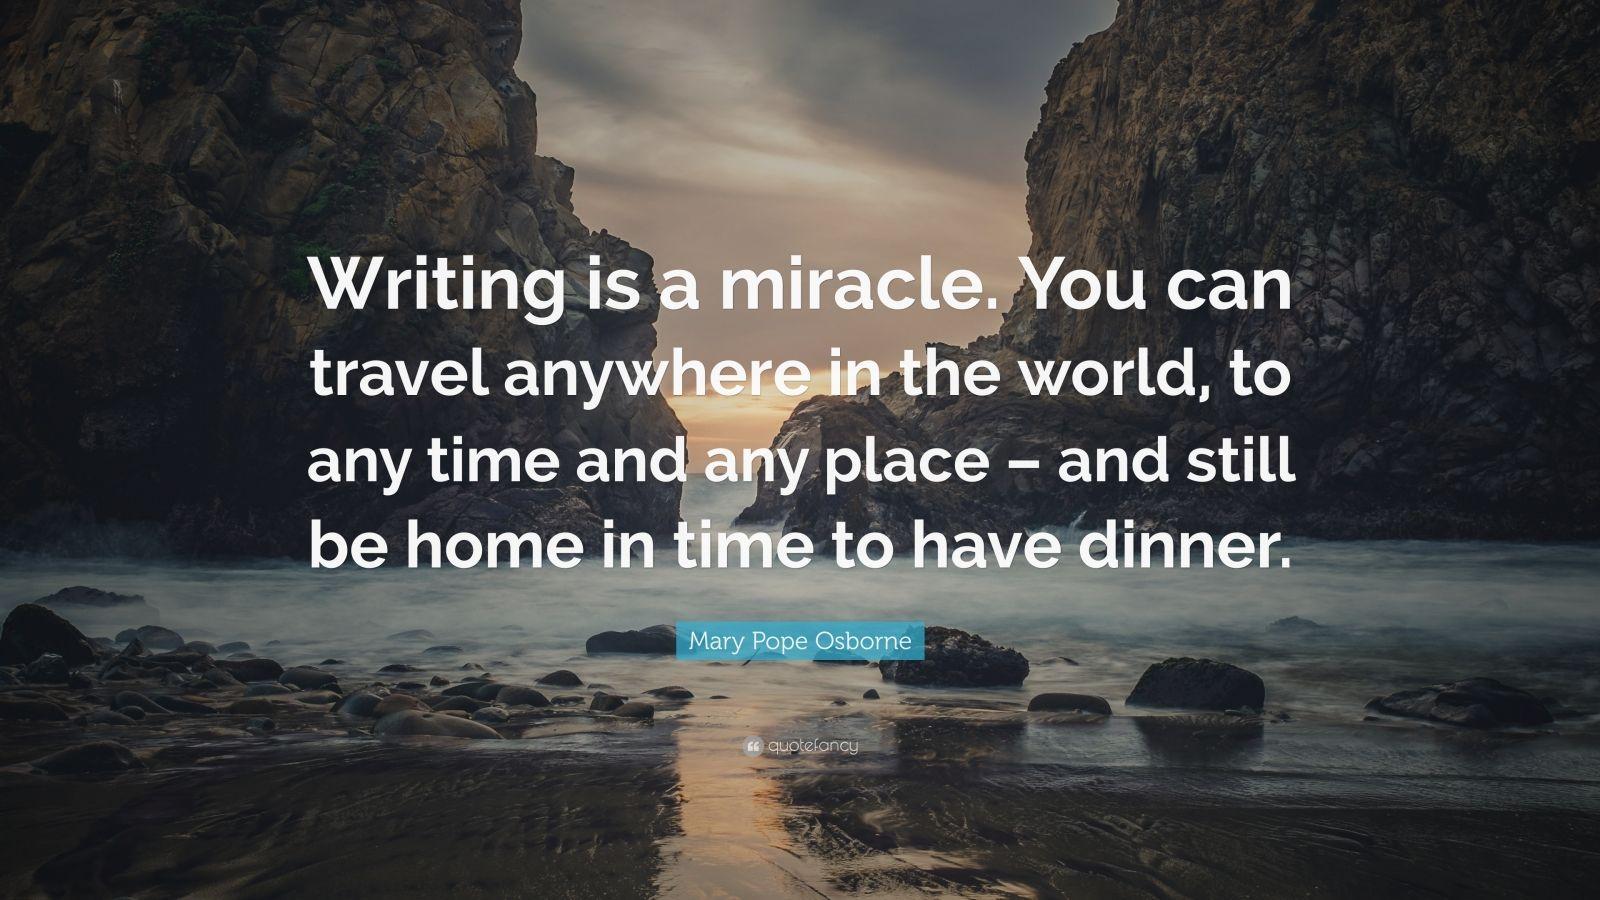 Mfa creative writing salary